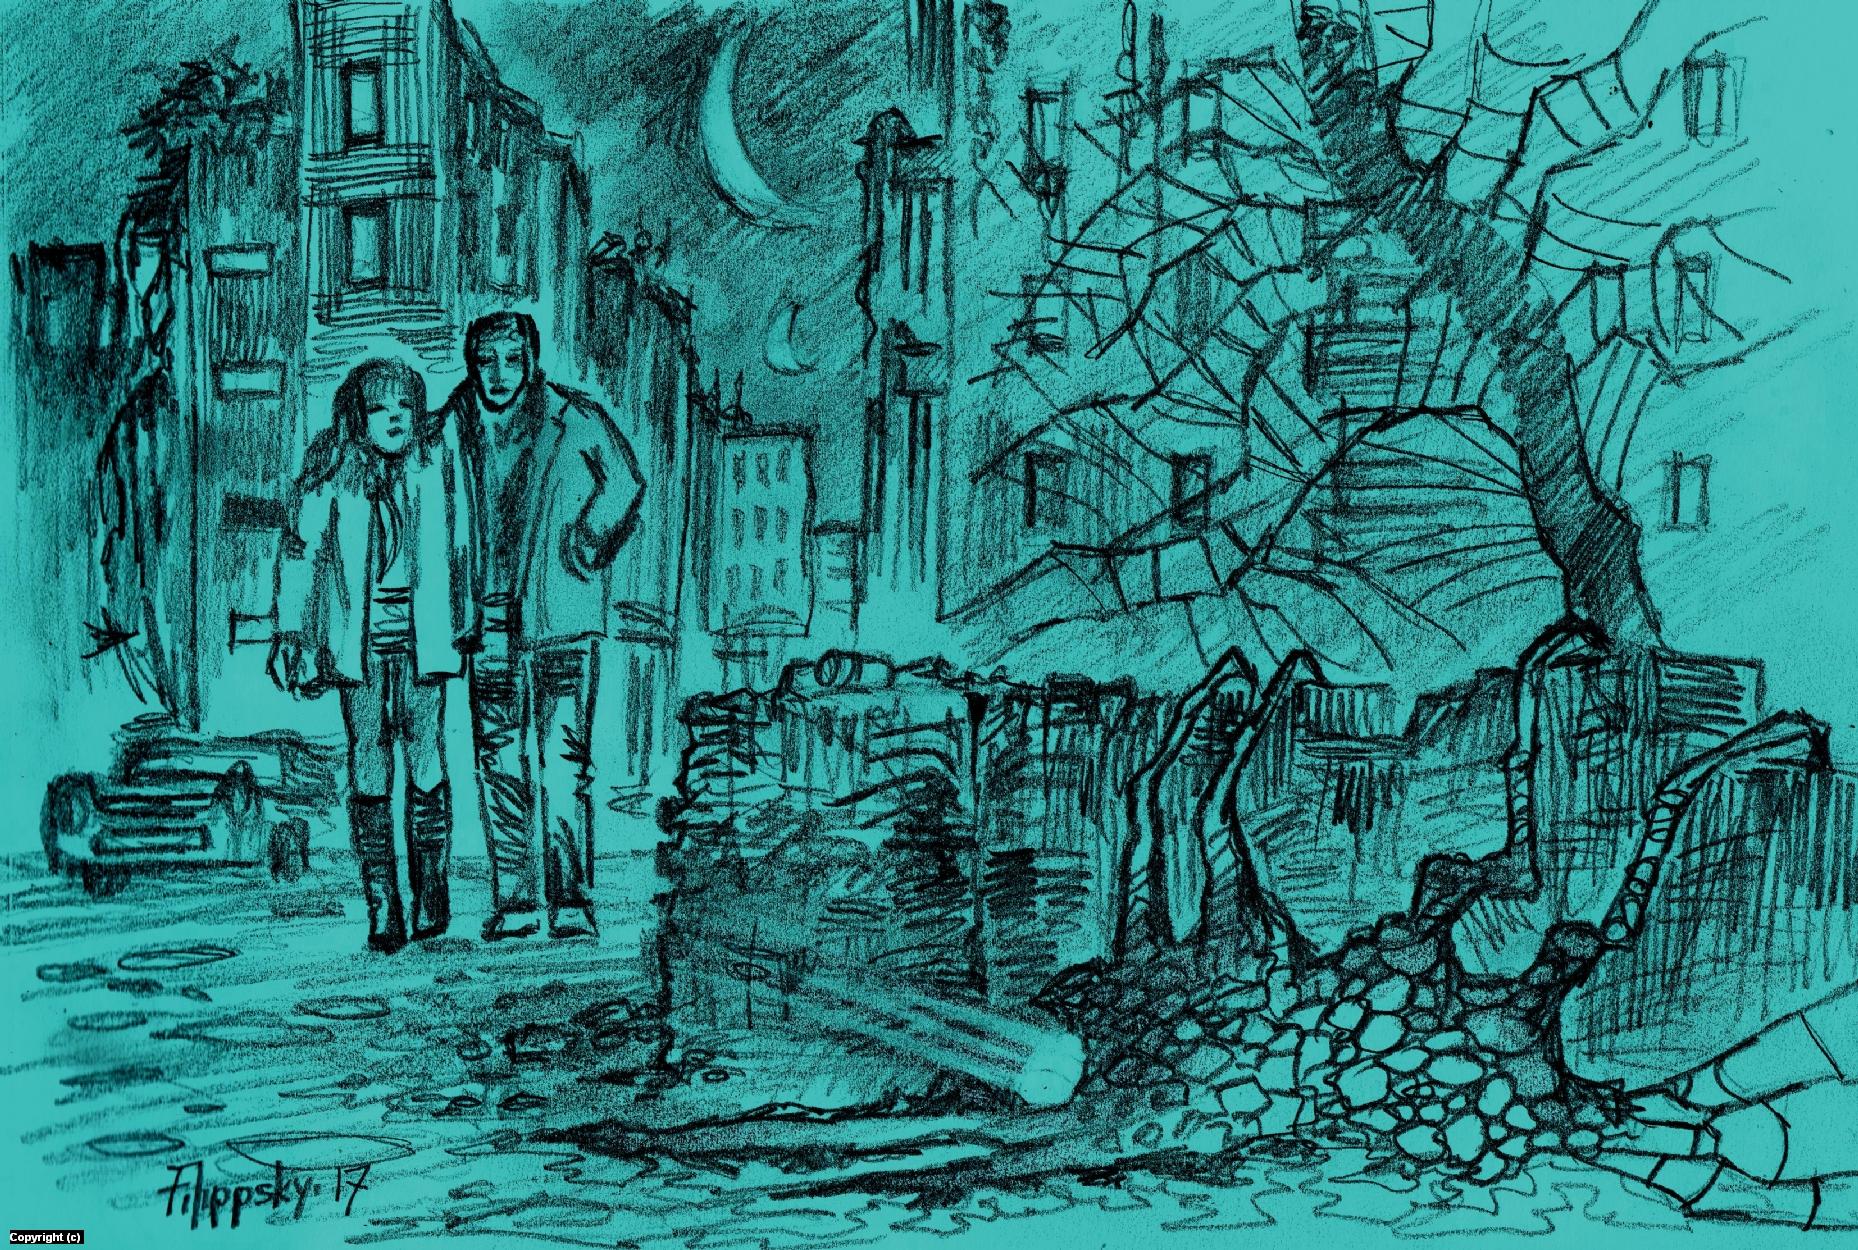 An evening walk. Artwork by Victor Filippsky